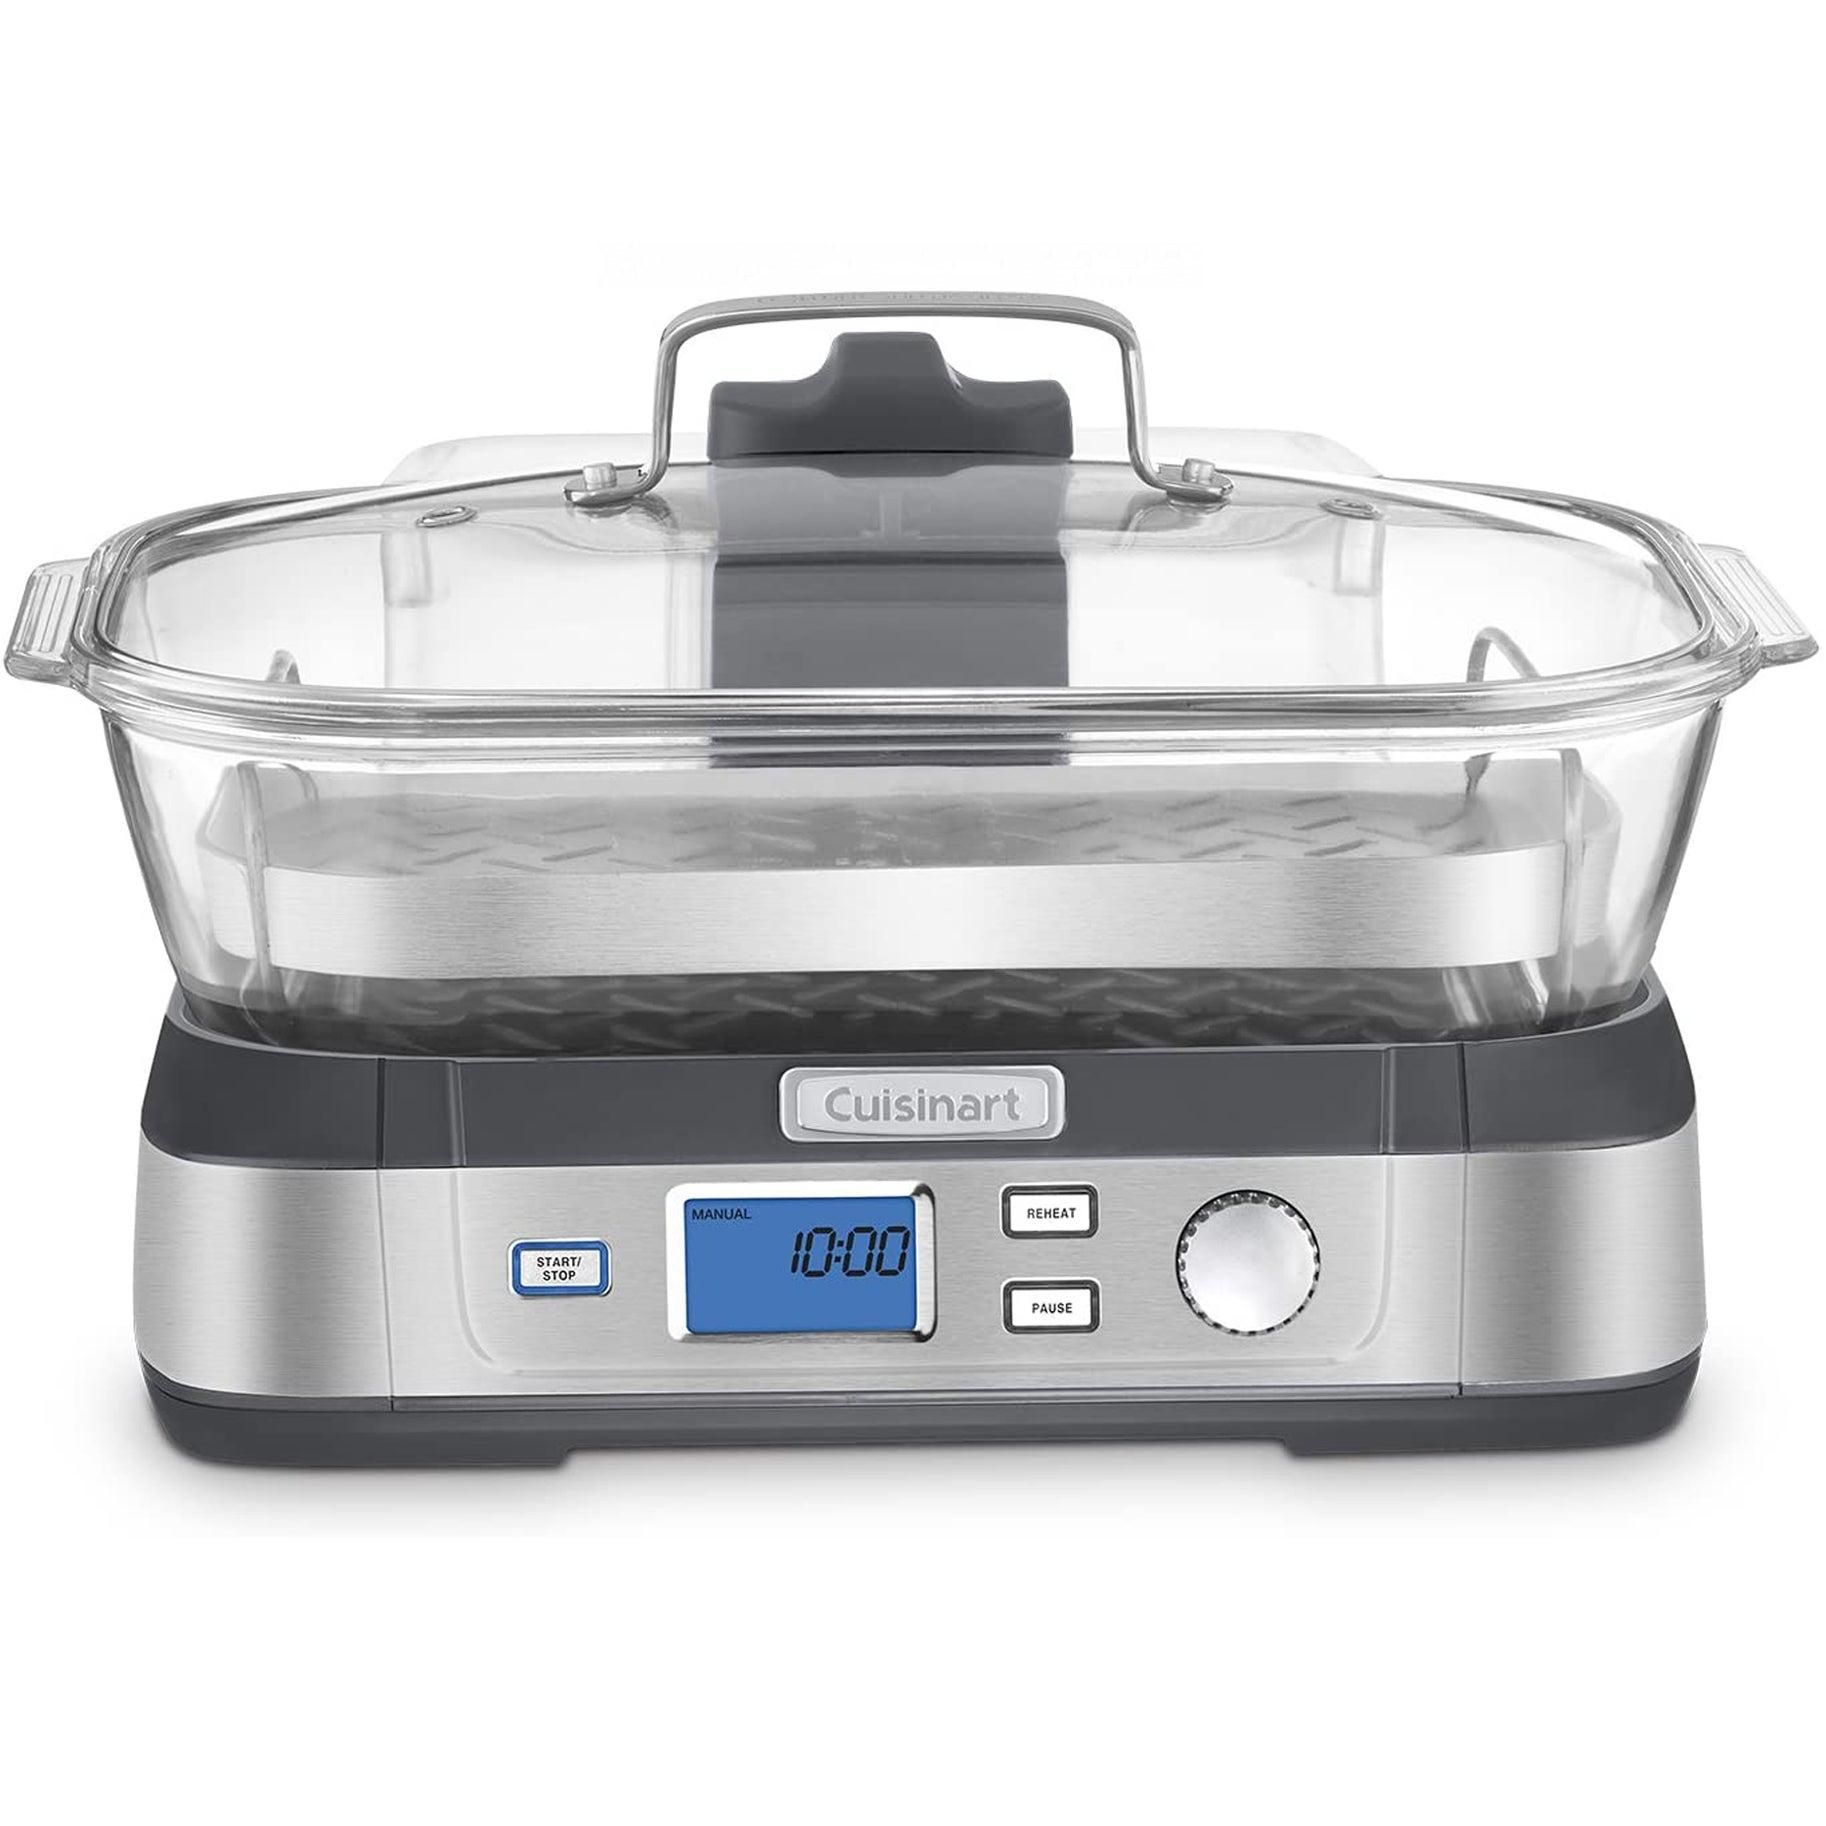 The Best Food Steamers Option: Cuisinart Digital Glass Steamer